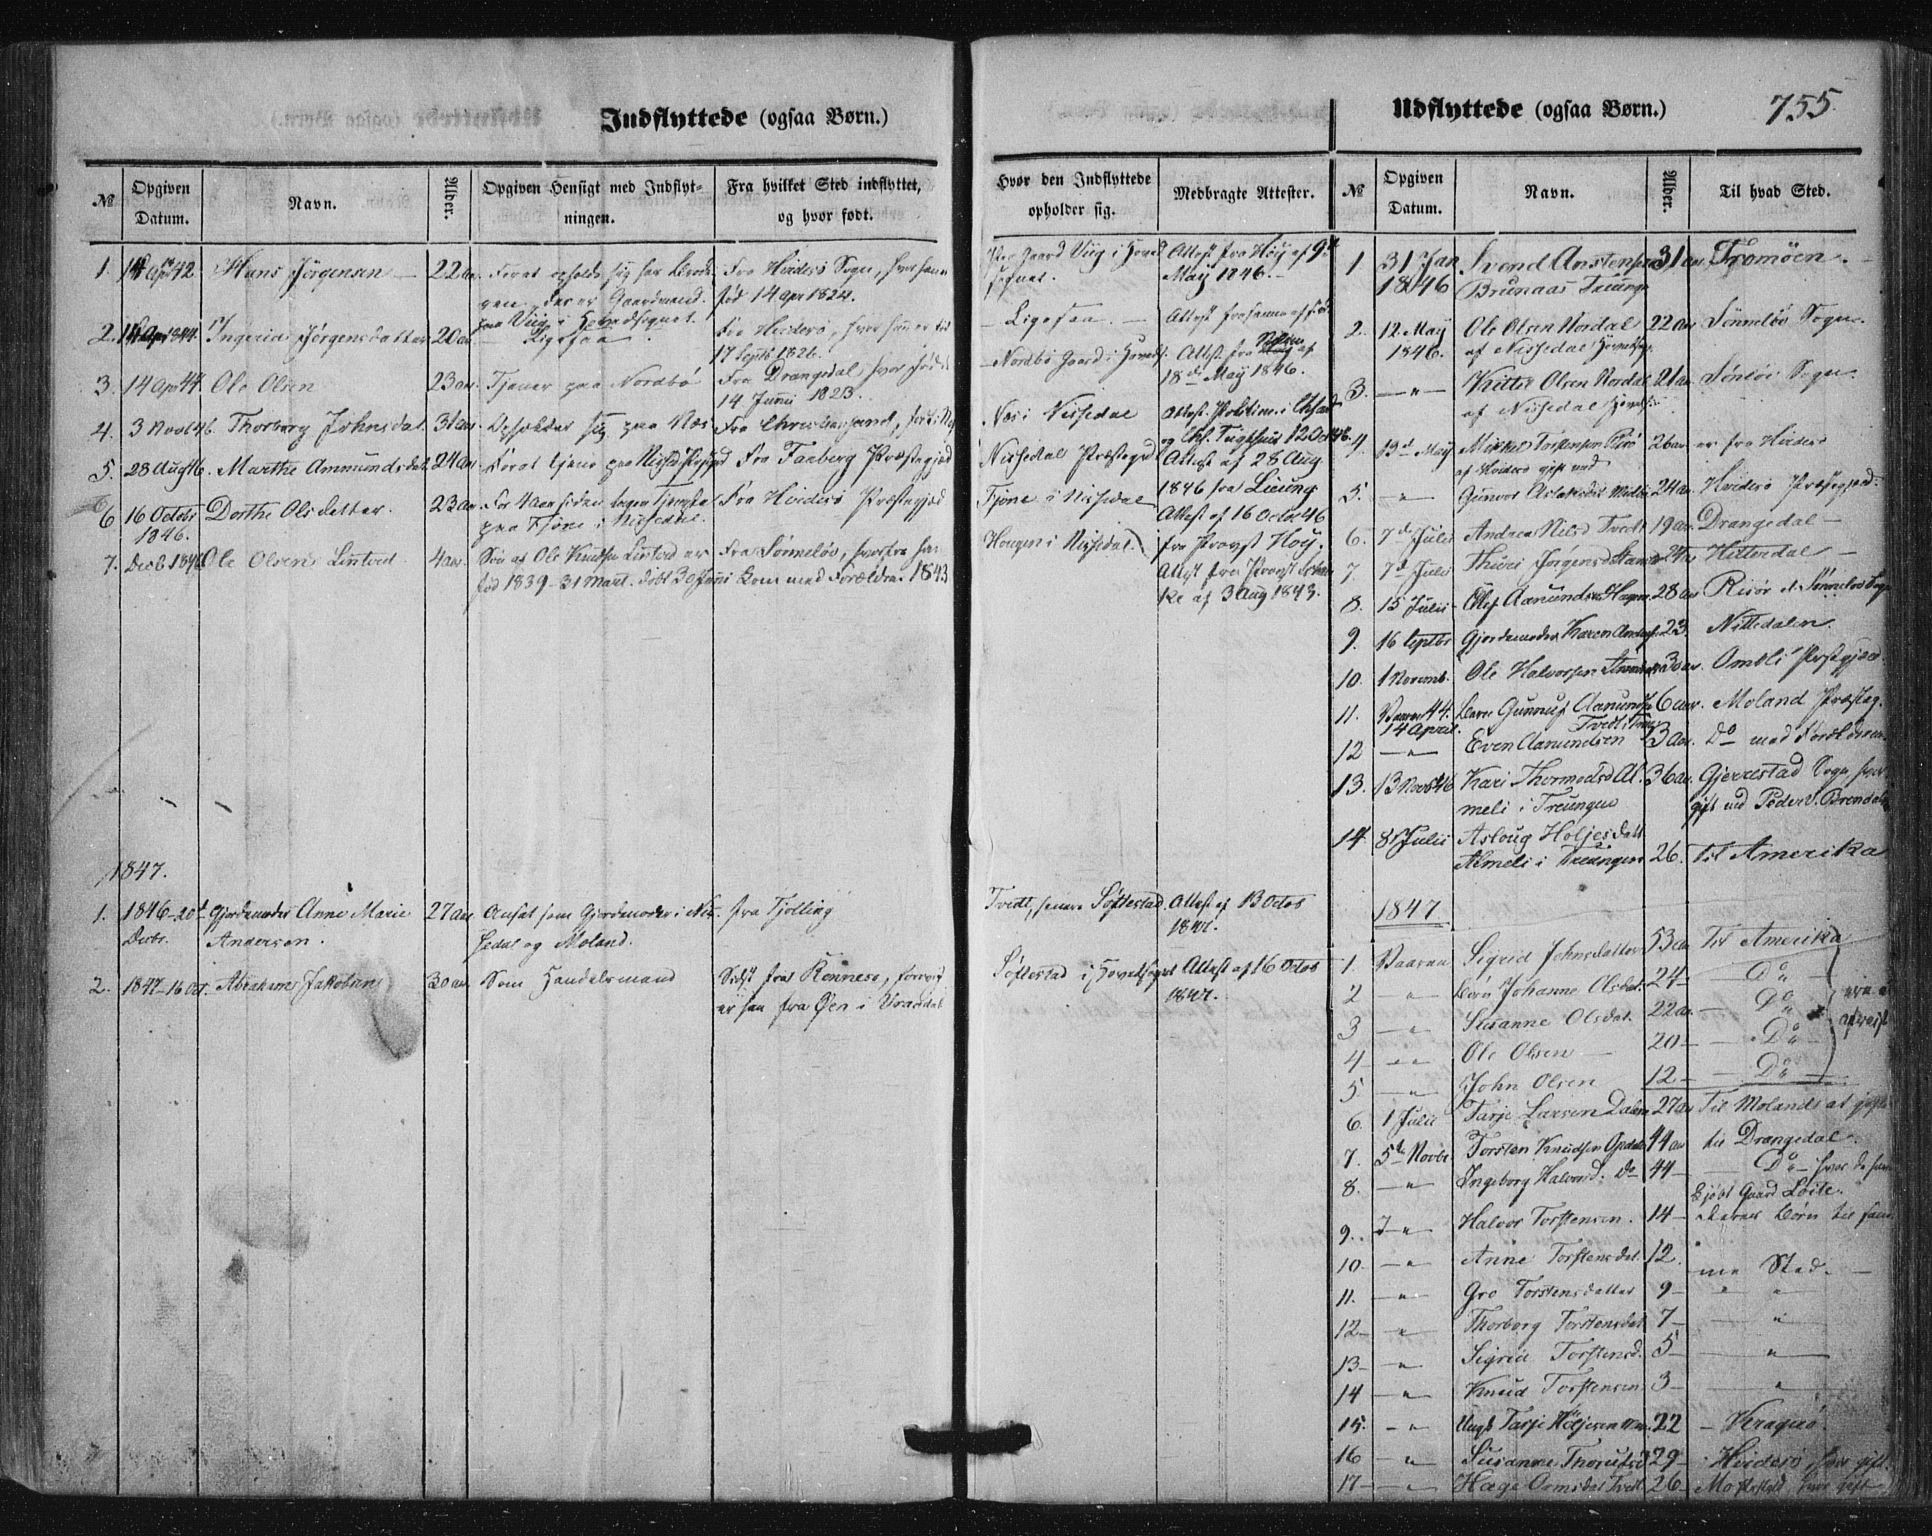 SAKO, Nissedal kirkebøker, F/Fa/L0003: Ministerialbok nr. I 3, 1846-1870, s. 754-755